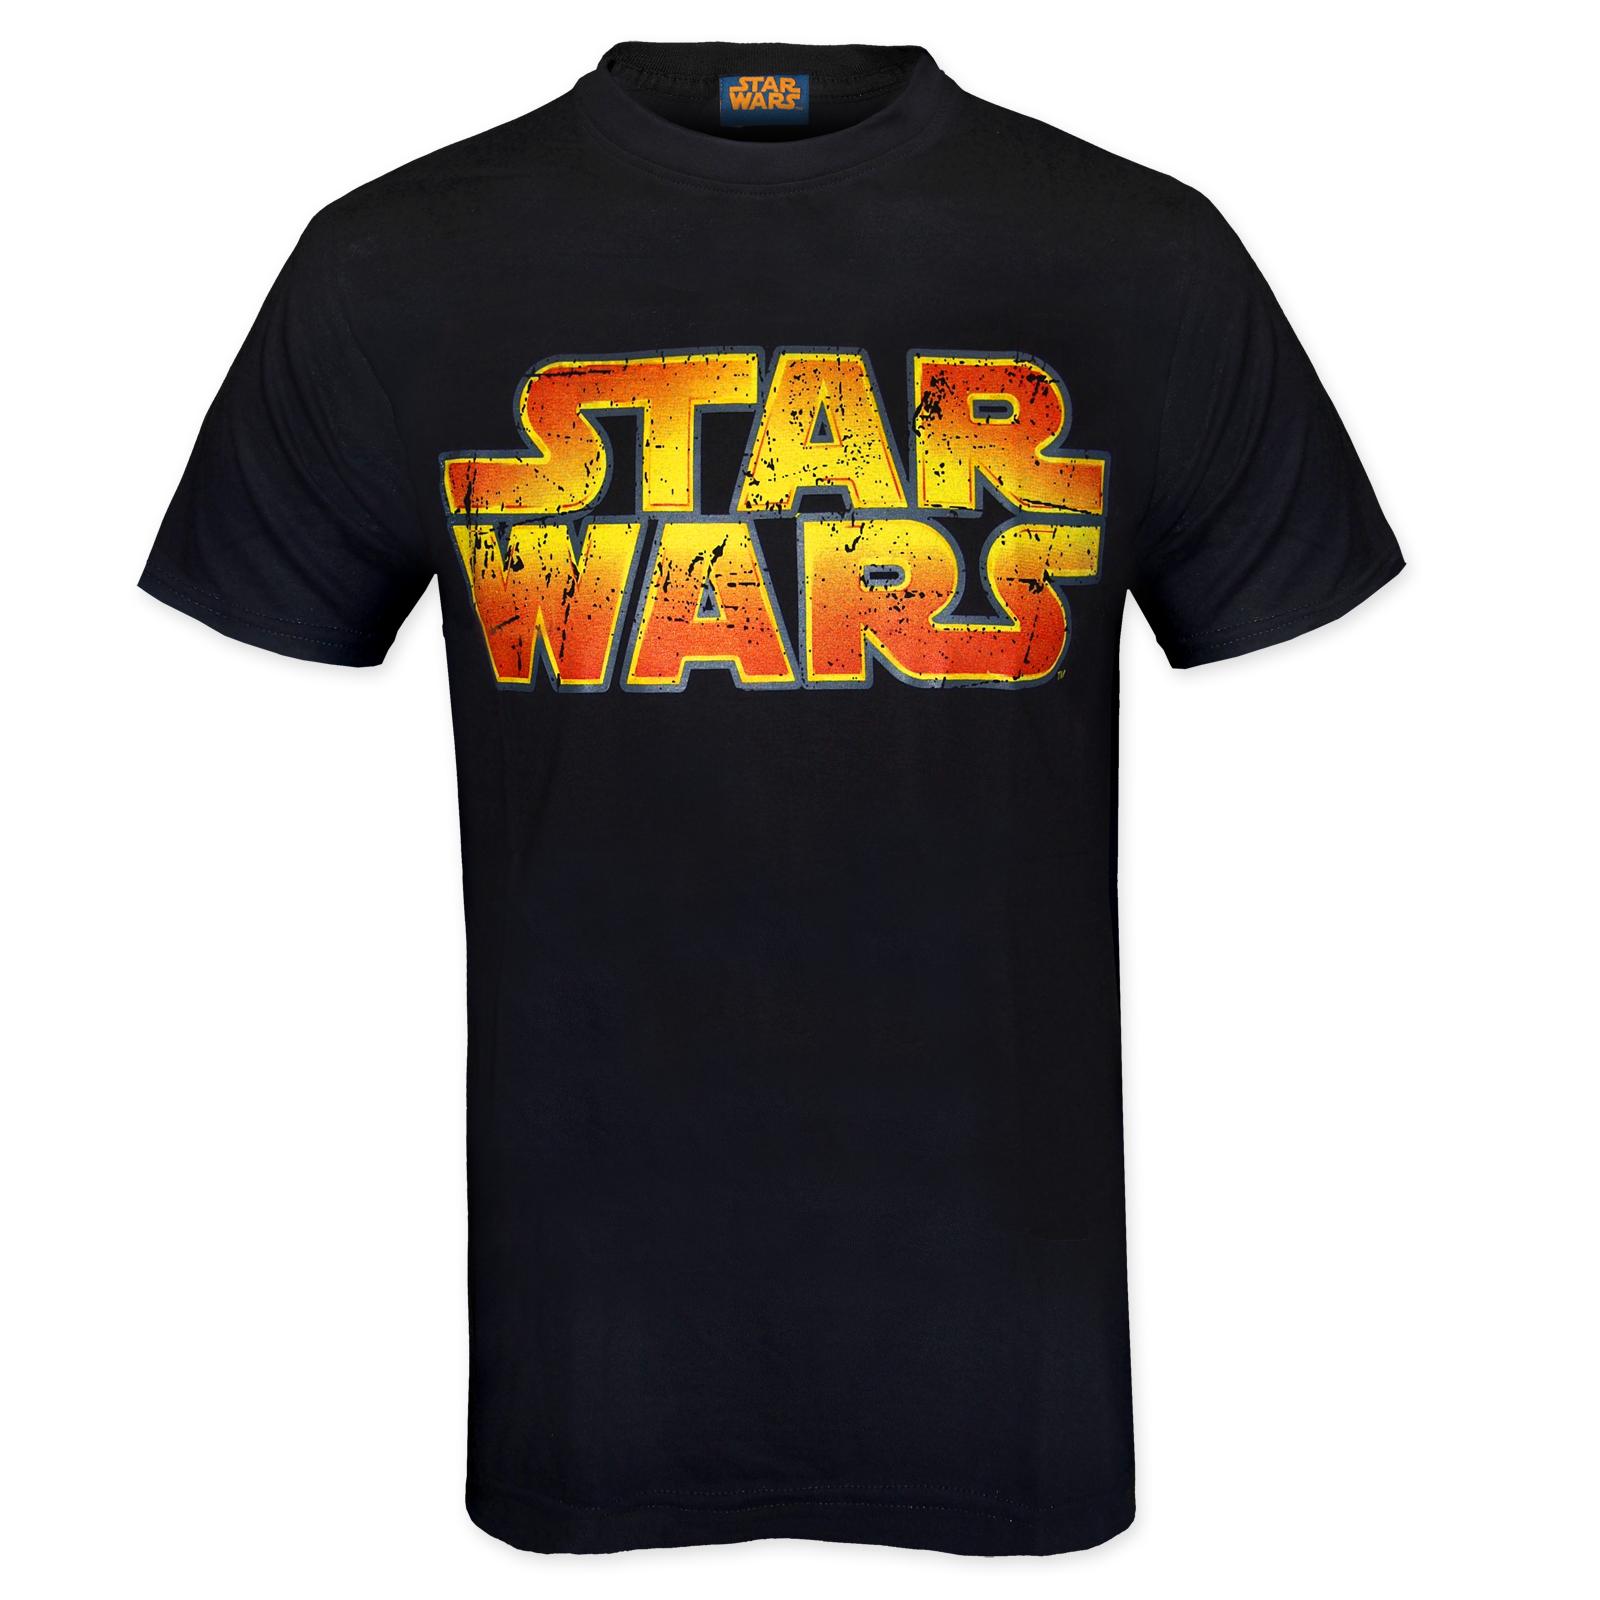 Star wars force awakens official darth vader yoda mens t for Mens shirt with stars